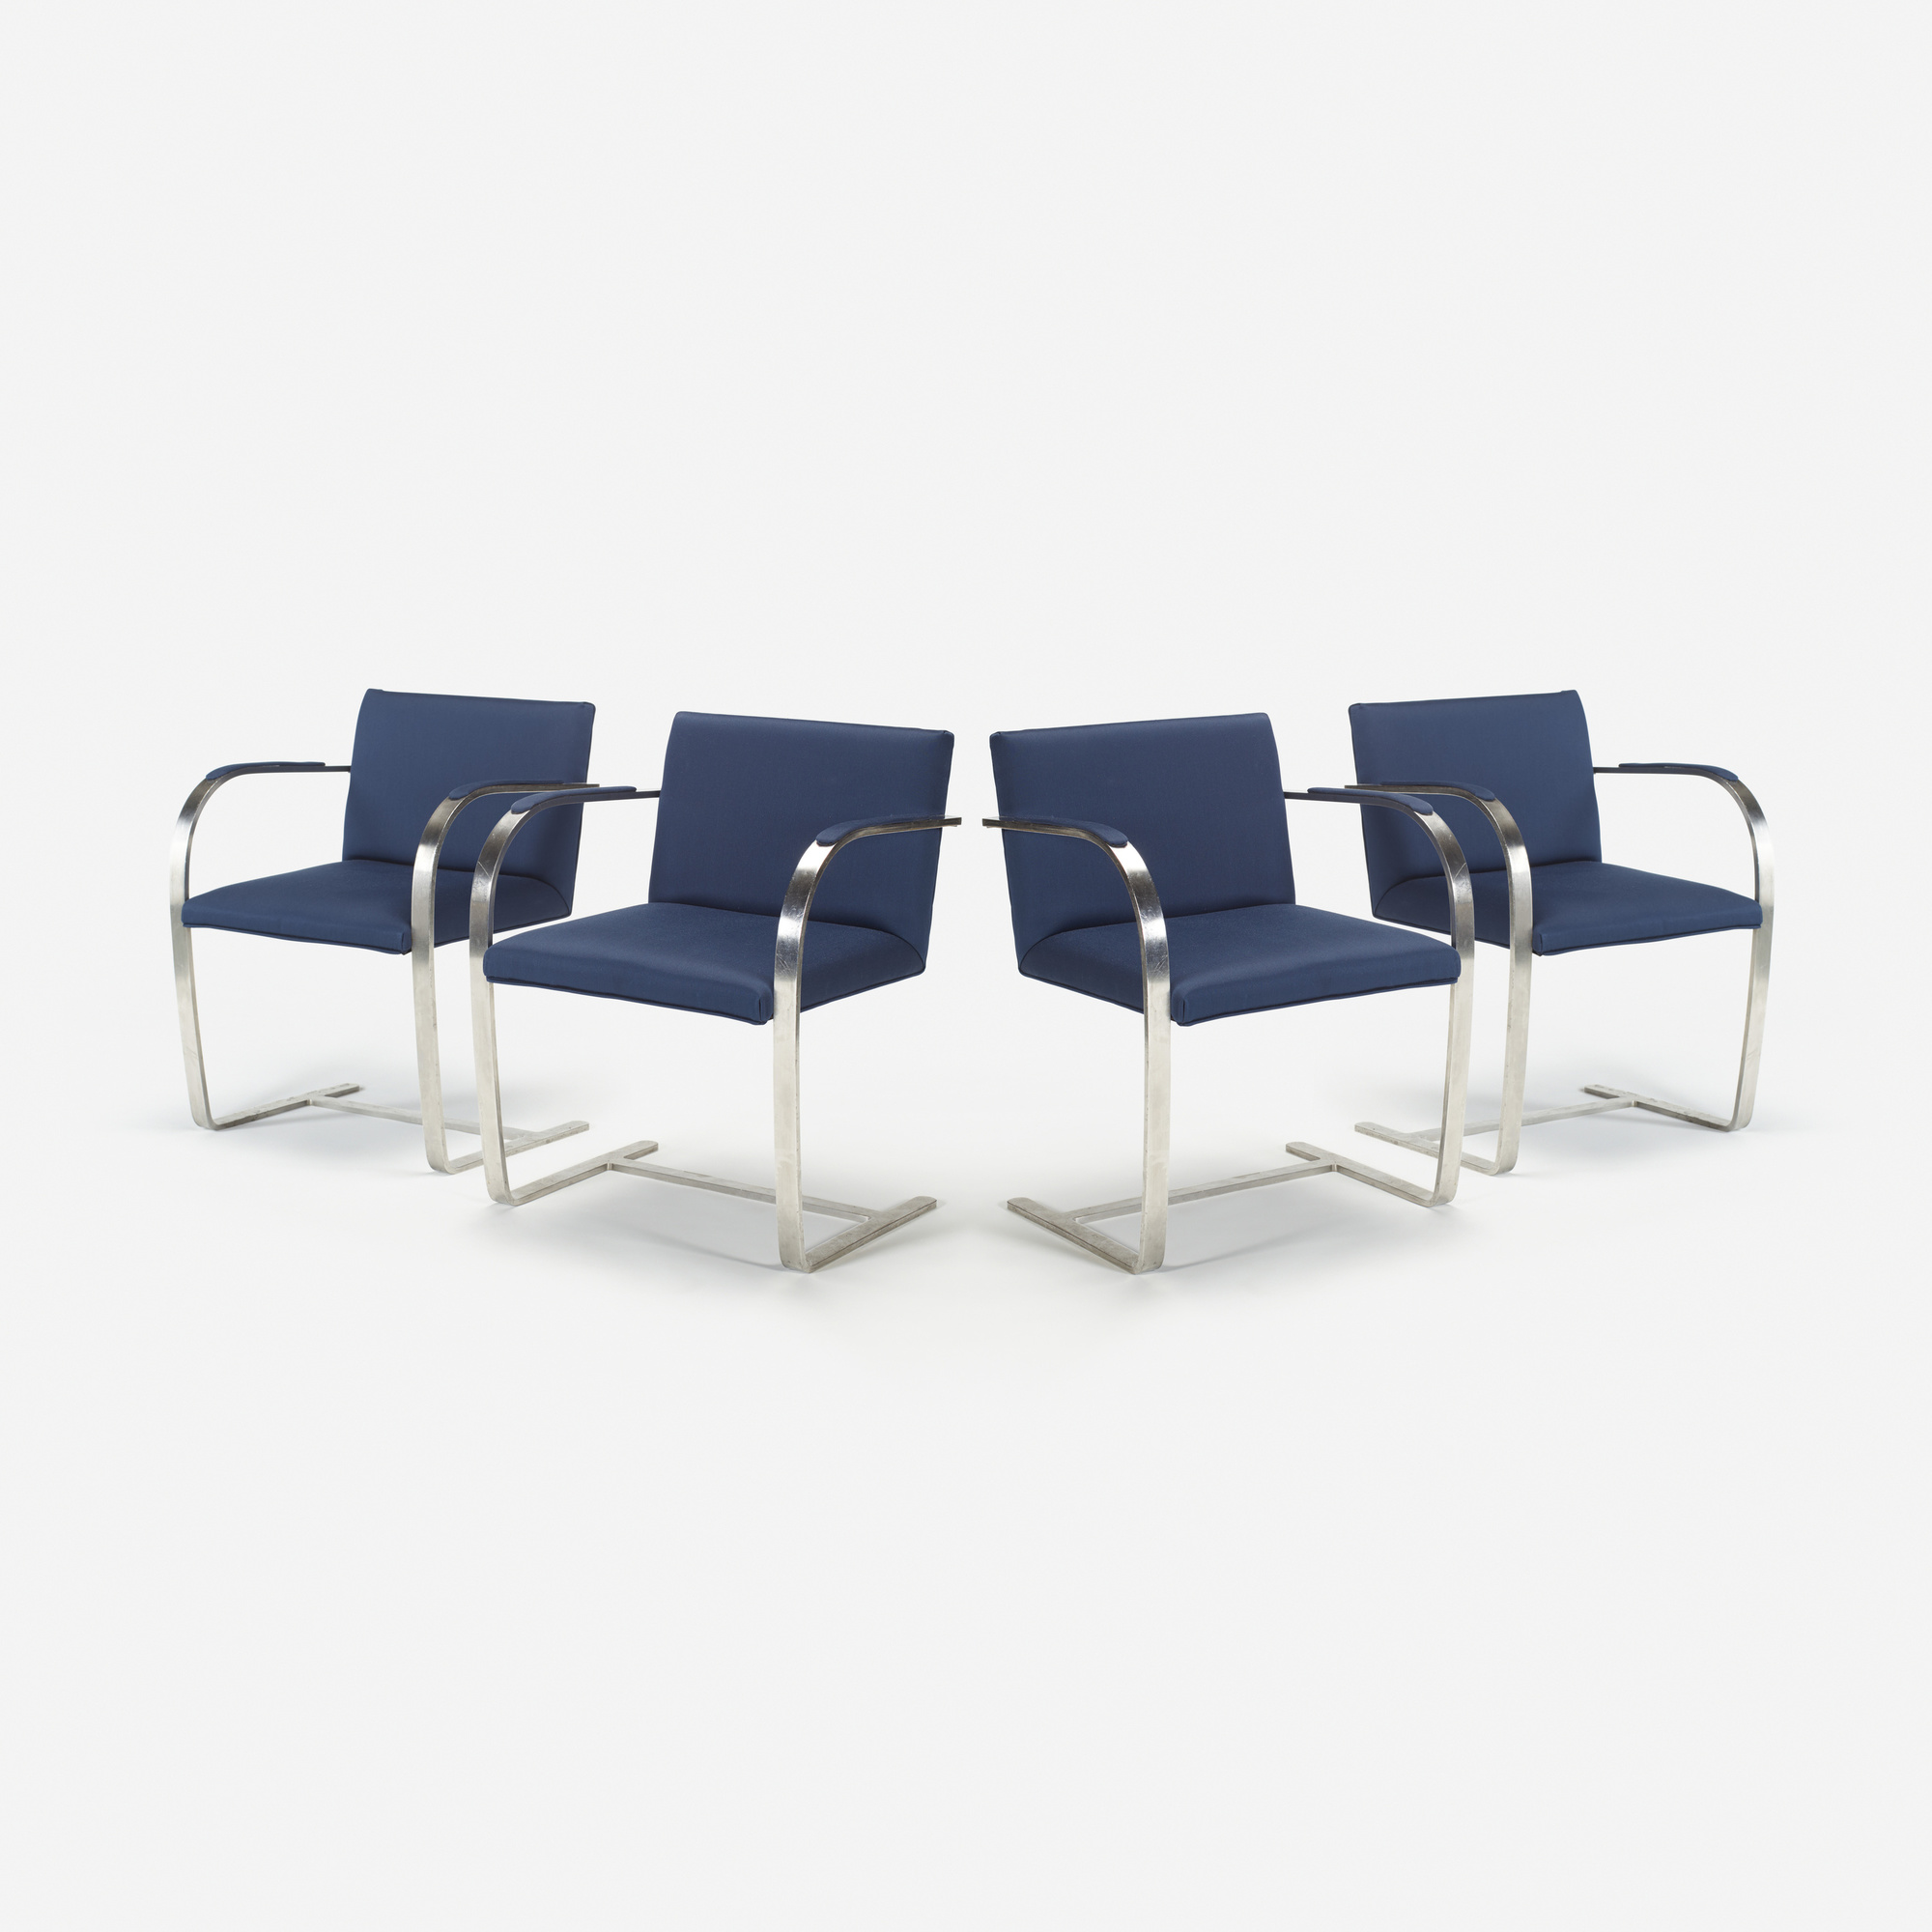 Mies Van Der Rohe Chair History Mies Van Der Rohe